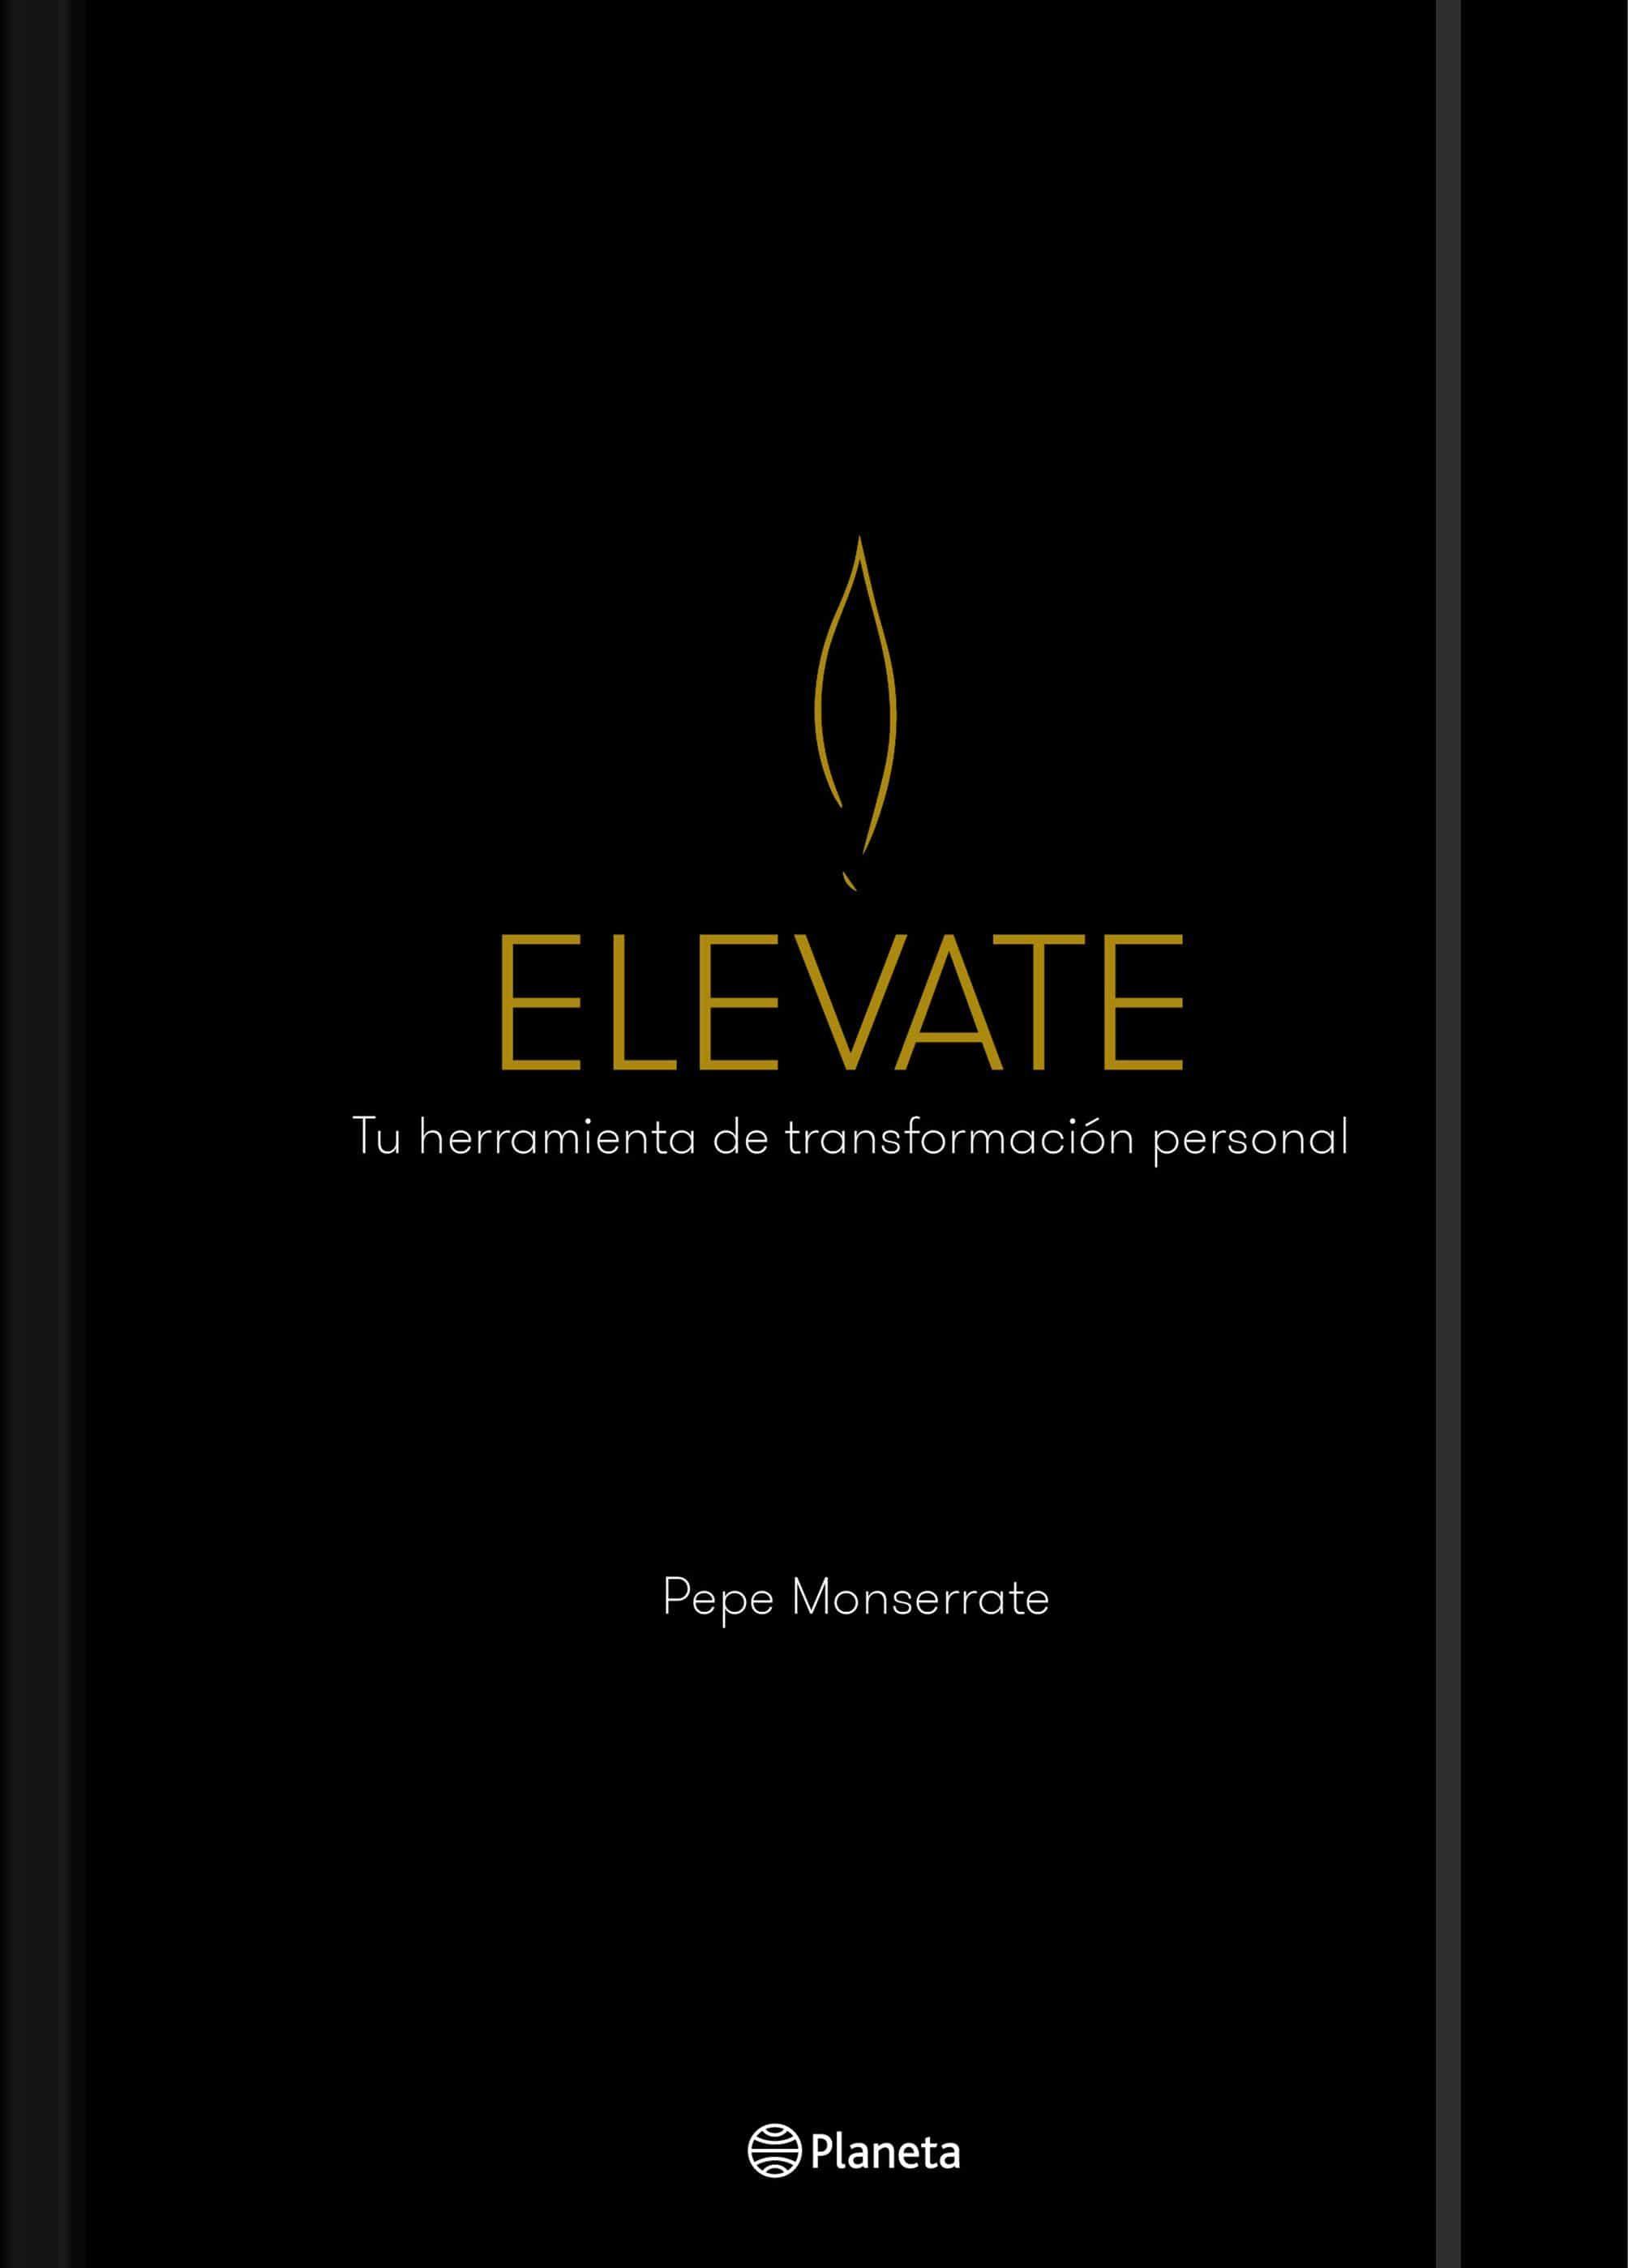 elevate-pepe monserrate-9788408201502